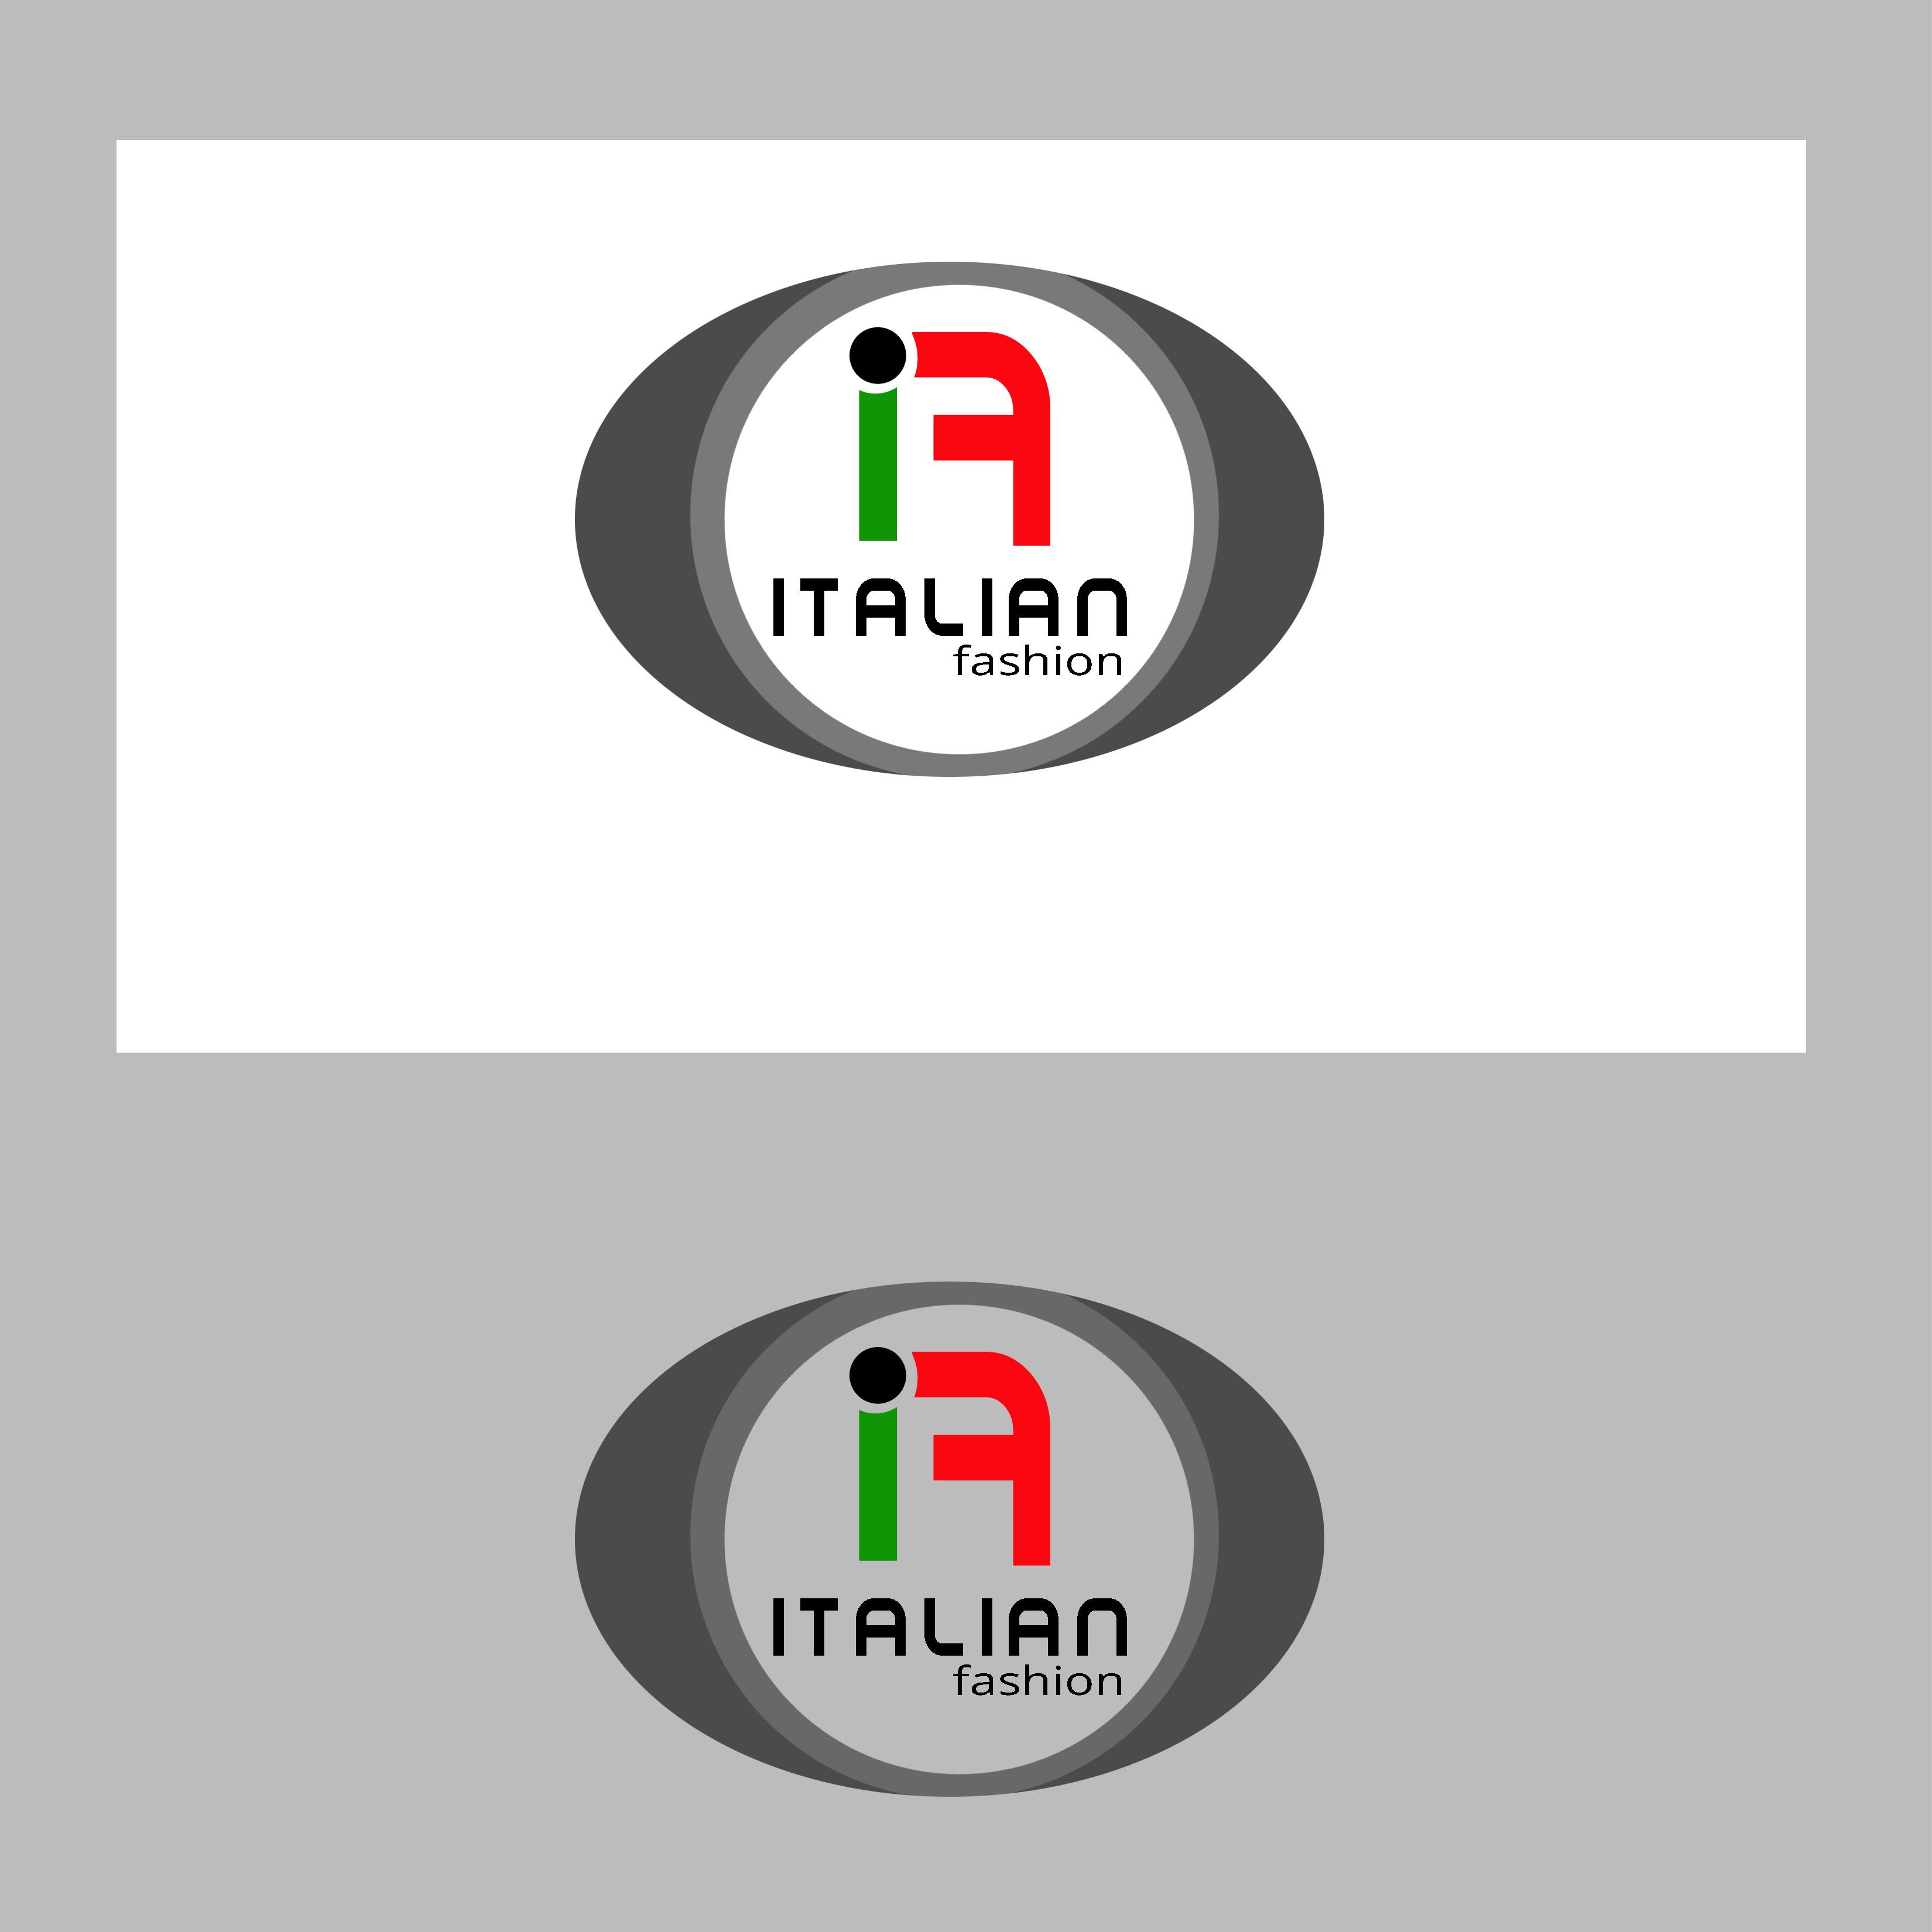 Logo Design by Allan Esclamado - Entry No. 96 in the Logo Design Contest Logo for Web Page ItalianFashion.cz.